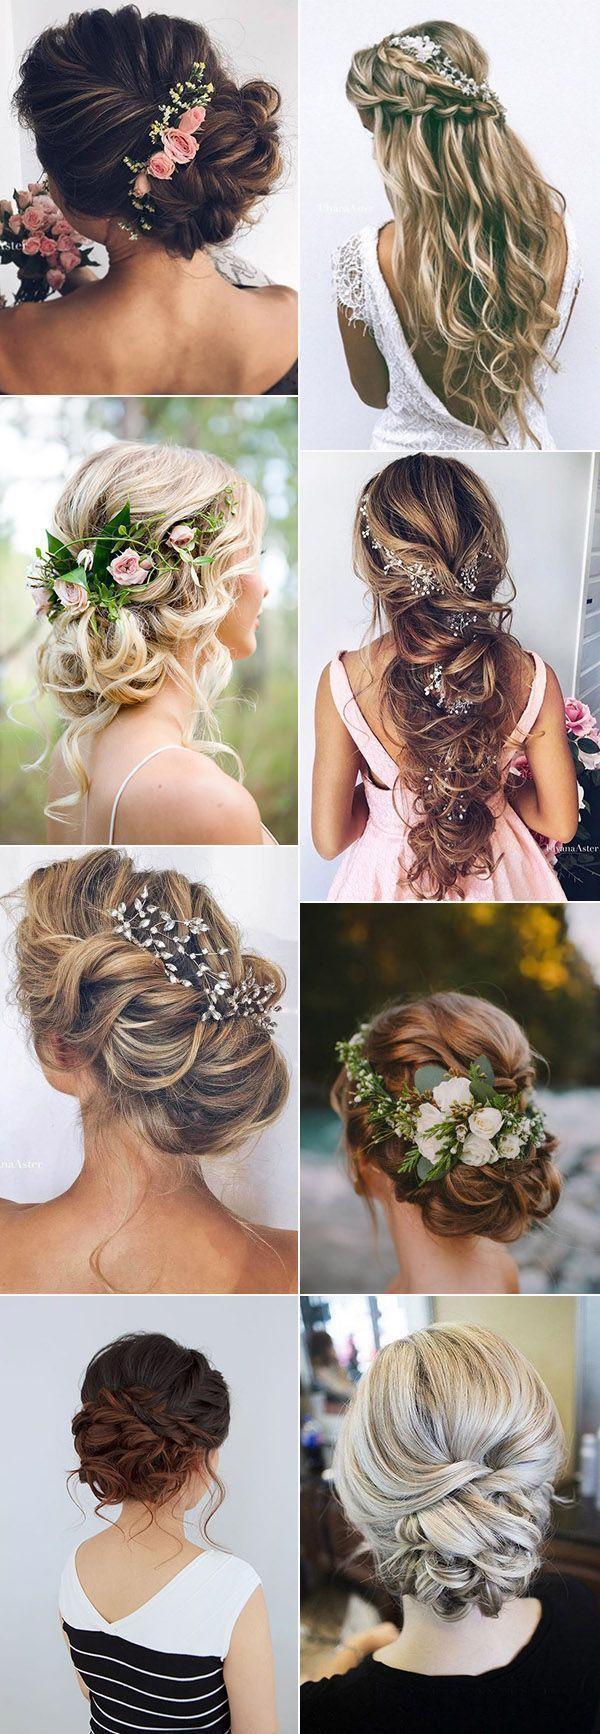 #fr #hair #hochzeitsfrisuren #ideas #ideen #lightmakeupwedding #makeup #top #trends , Makeup amp; Ha...